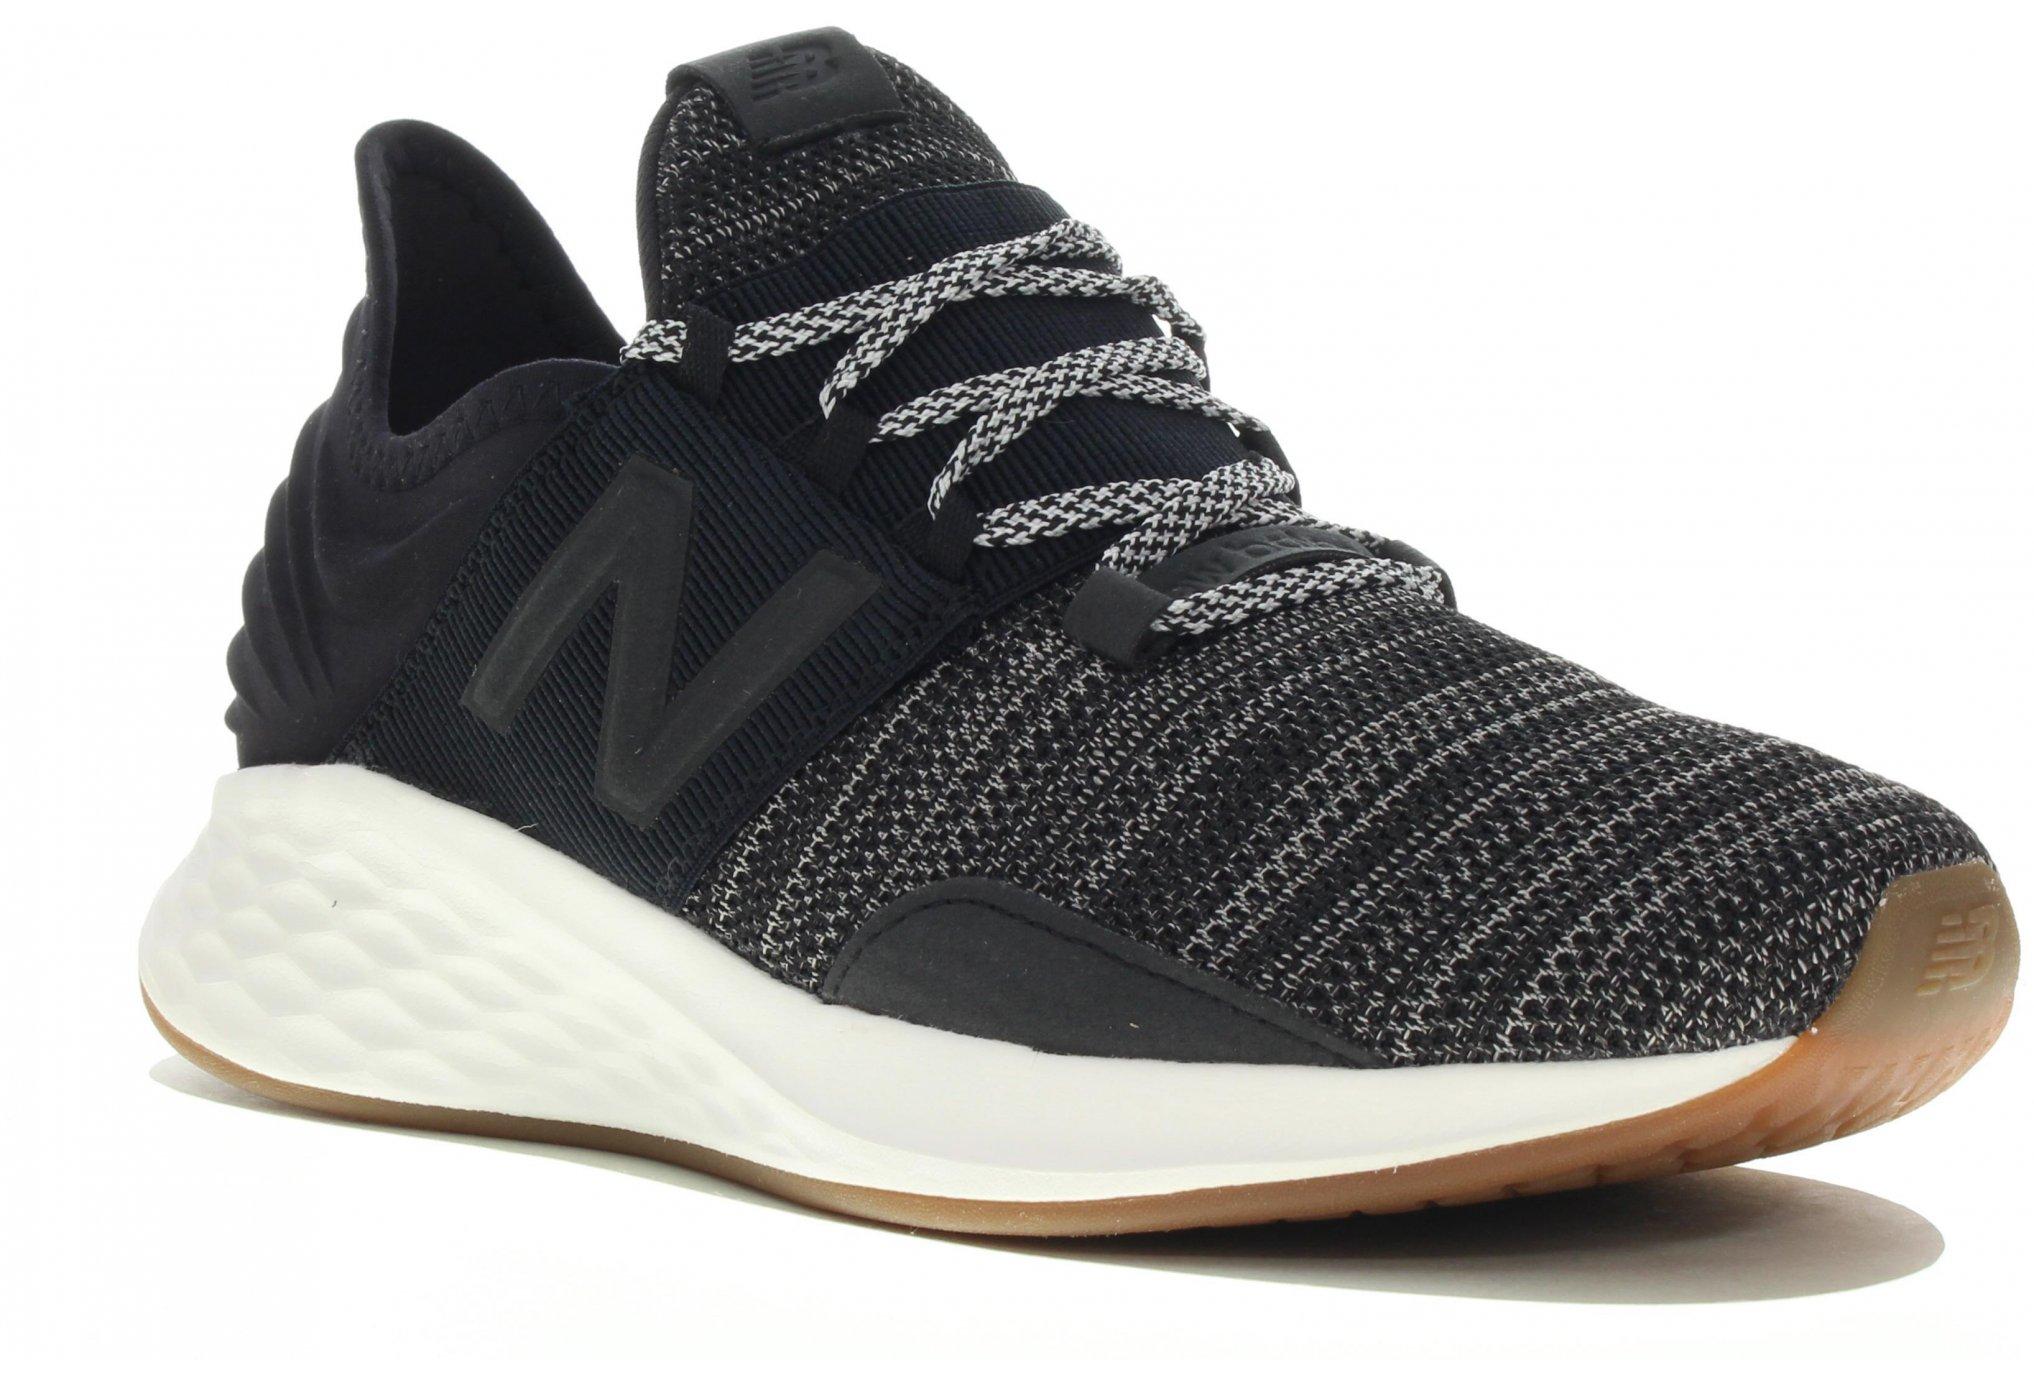 New Balance Fresh Foam Roav Boundaries W Chaussures running femme